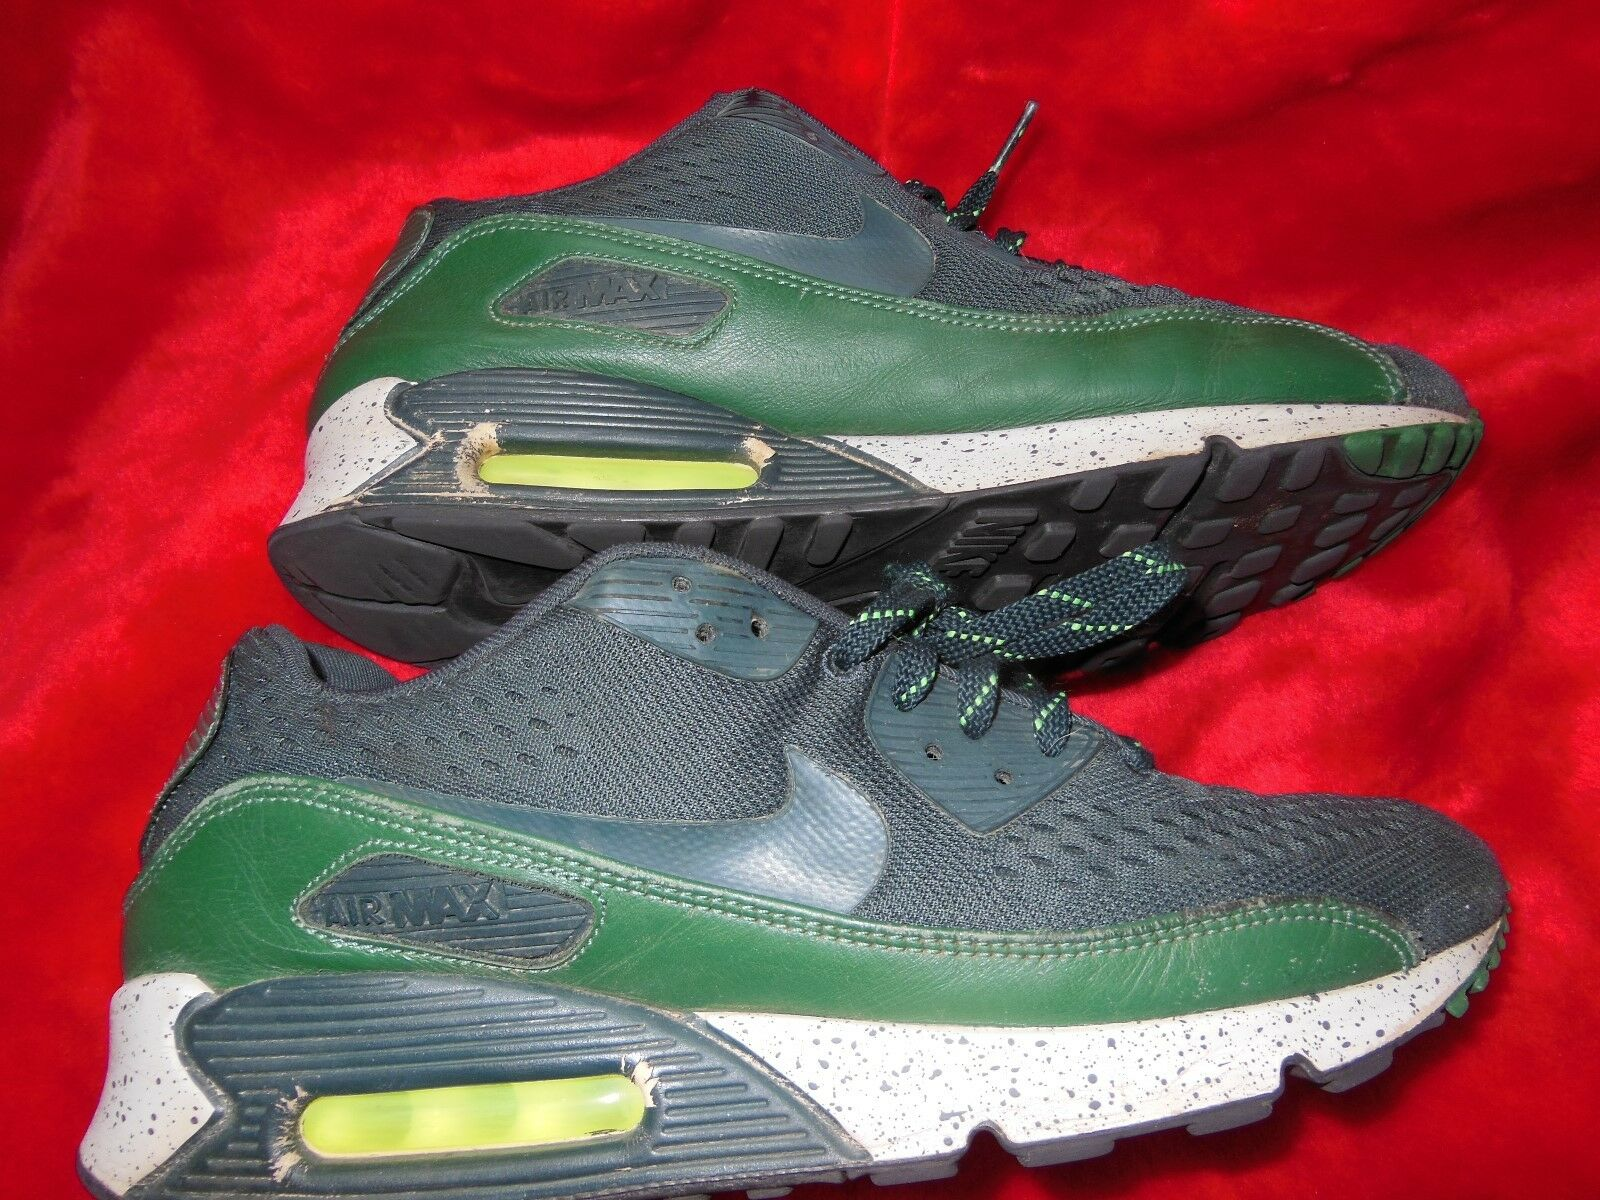 Nike Air Max Mesh Seaweed Green Grey SZ 10 10 10 d78bca